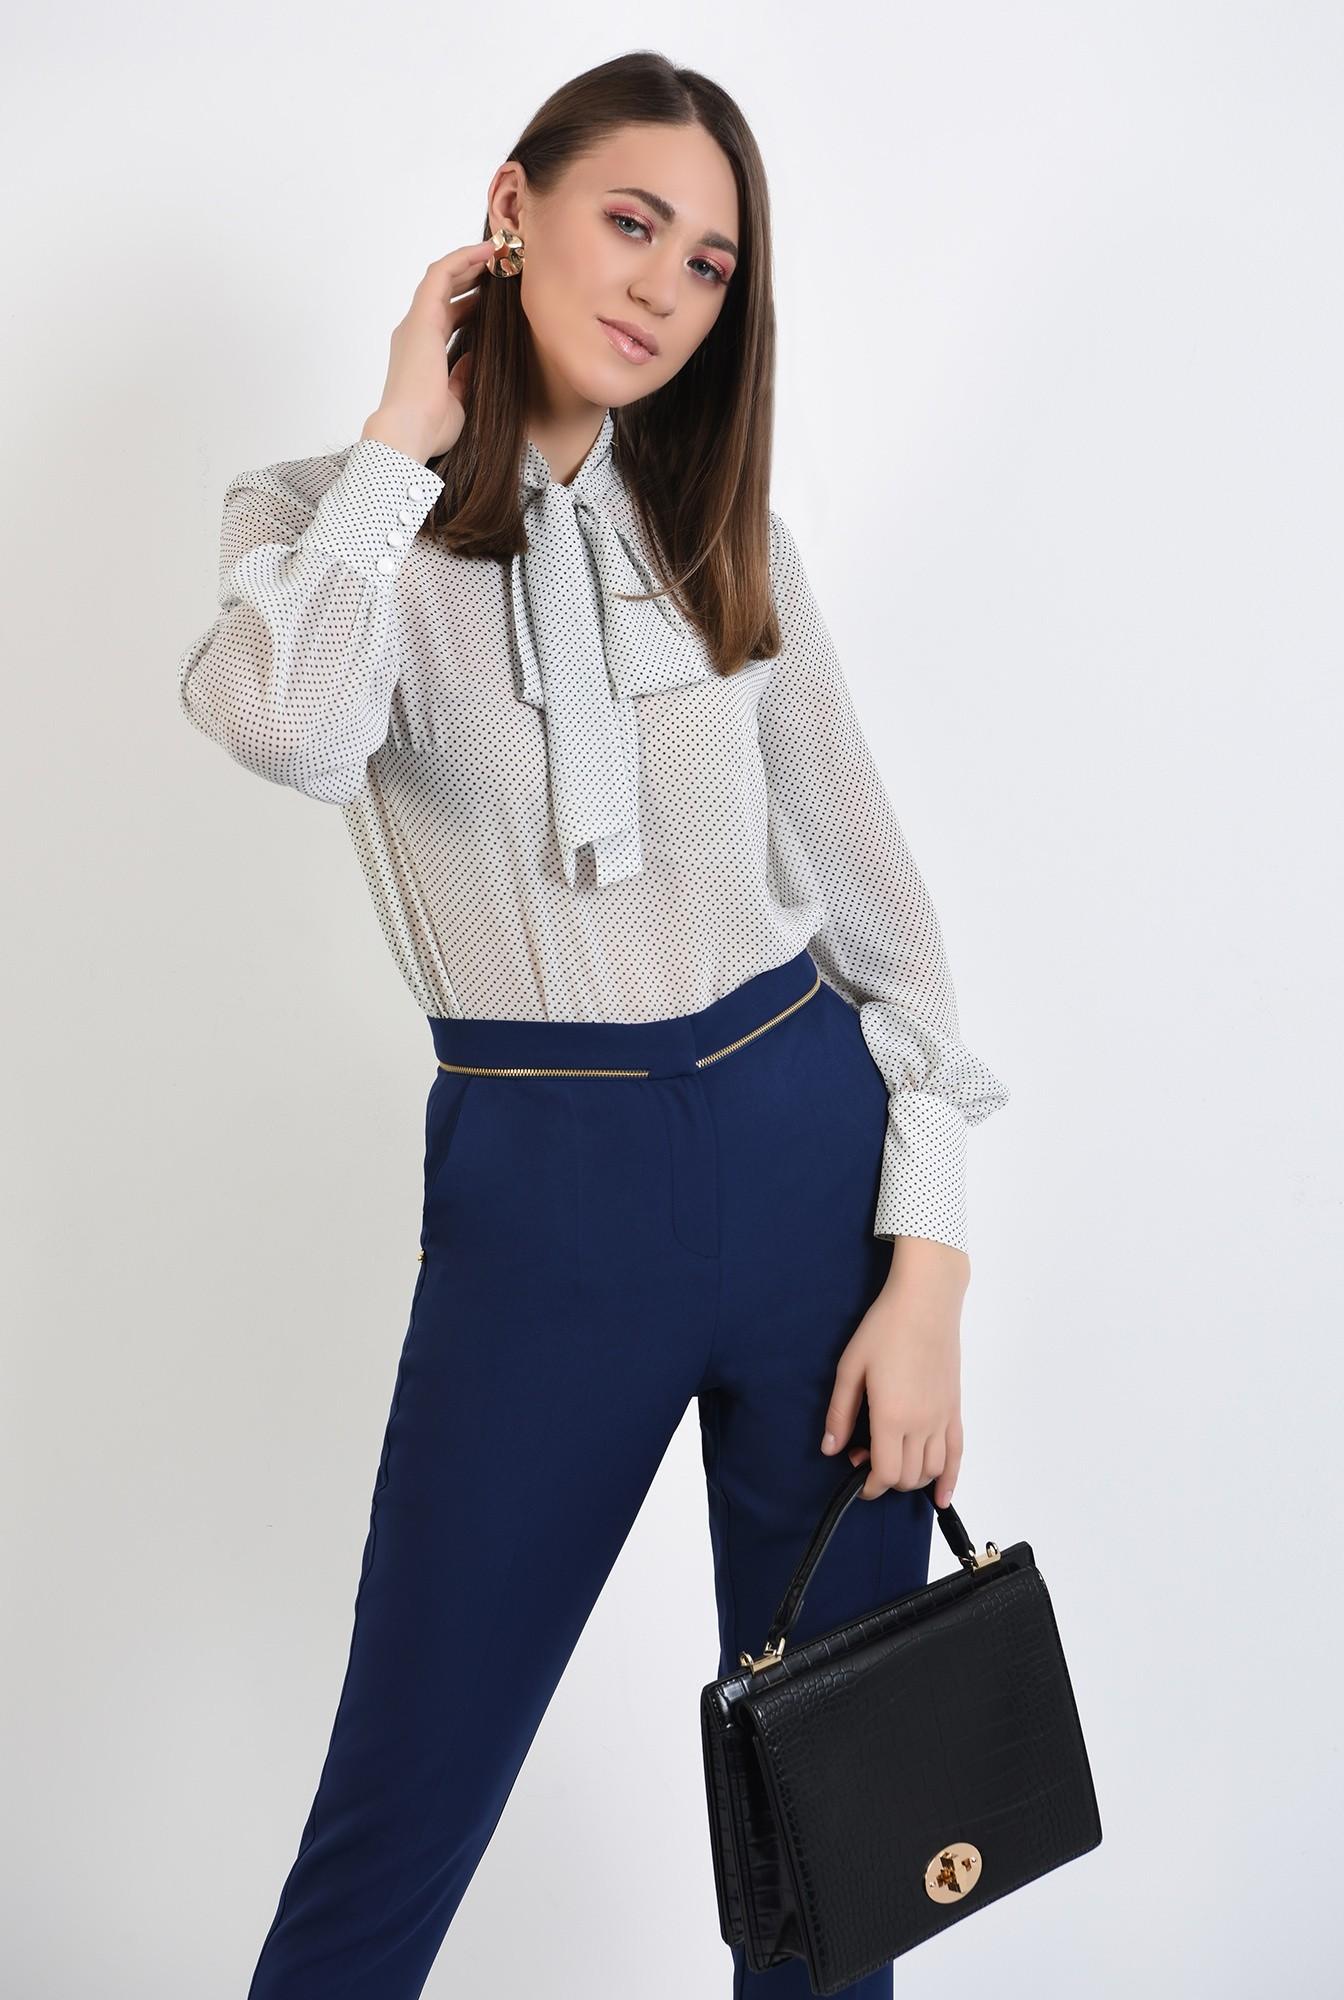 2 - pantaloni office, bleumarin, talie medie, cu buzunare, pantaloni de primavara